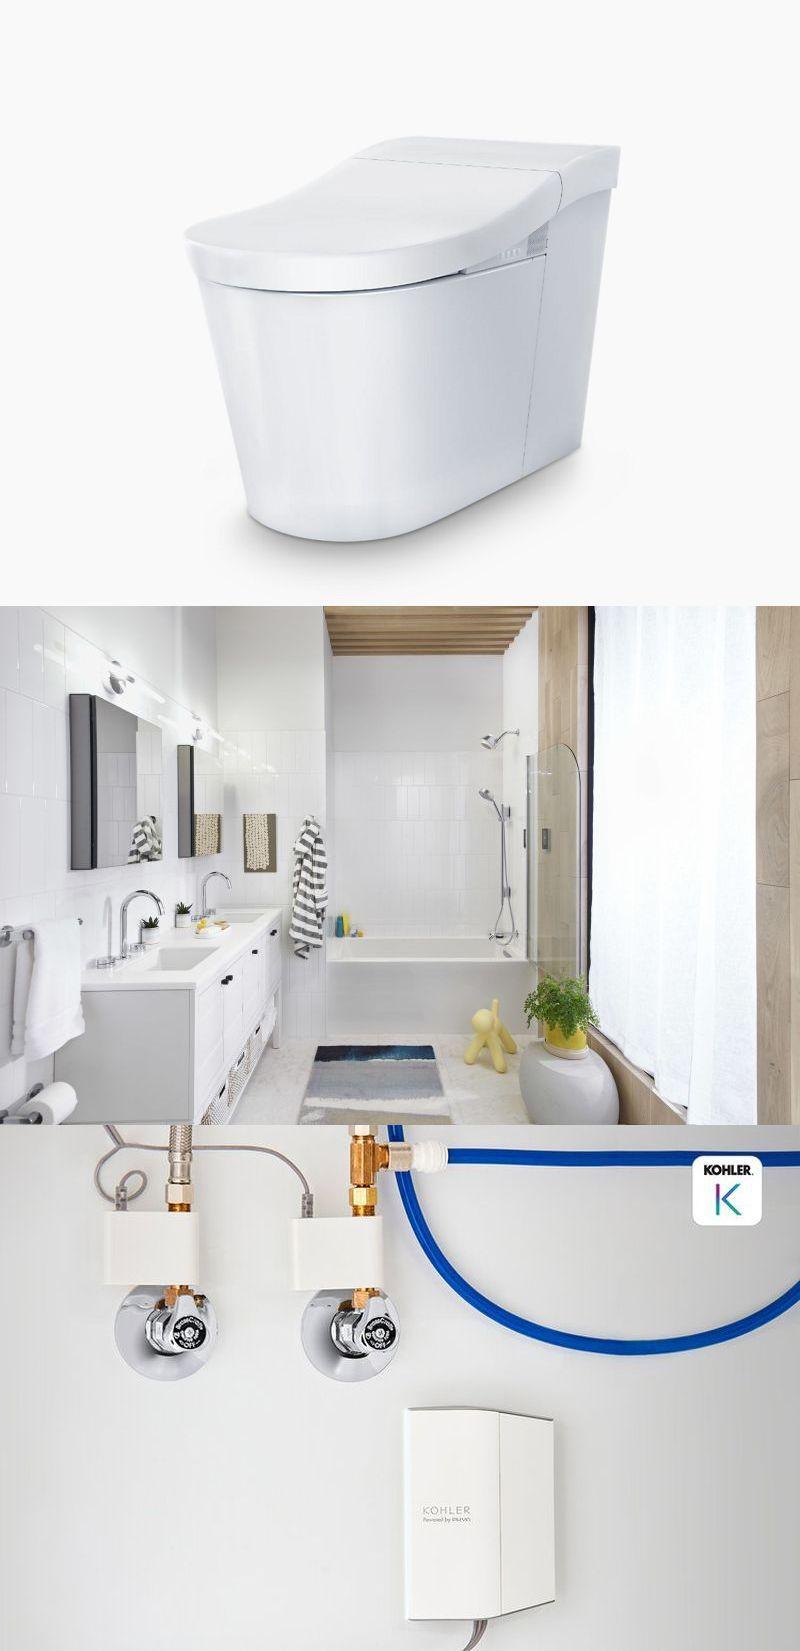 Kohler Showcases New Smart Bathroom Products At Ces 2021 In 2021 Smart Bathroom Bathroom Smart Faucet [ 1651 x 800 Pixel ]